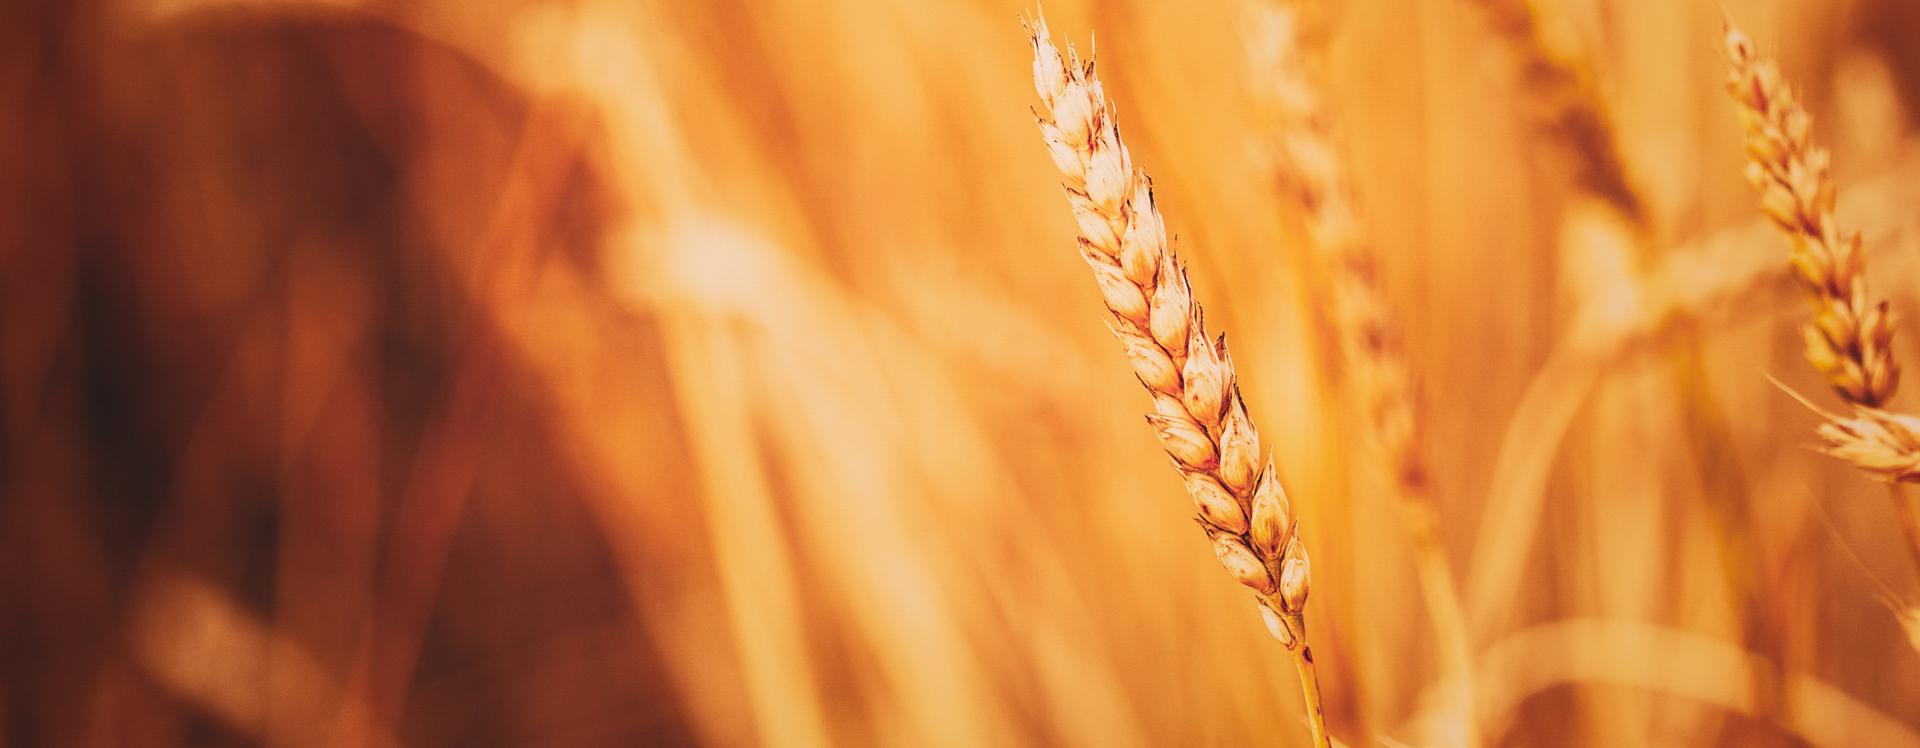 Catalysis Viusid Agro. Cuida, mejora y protege tus cultivos